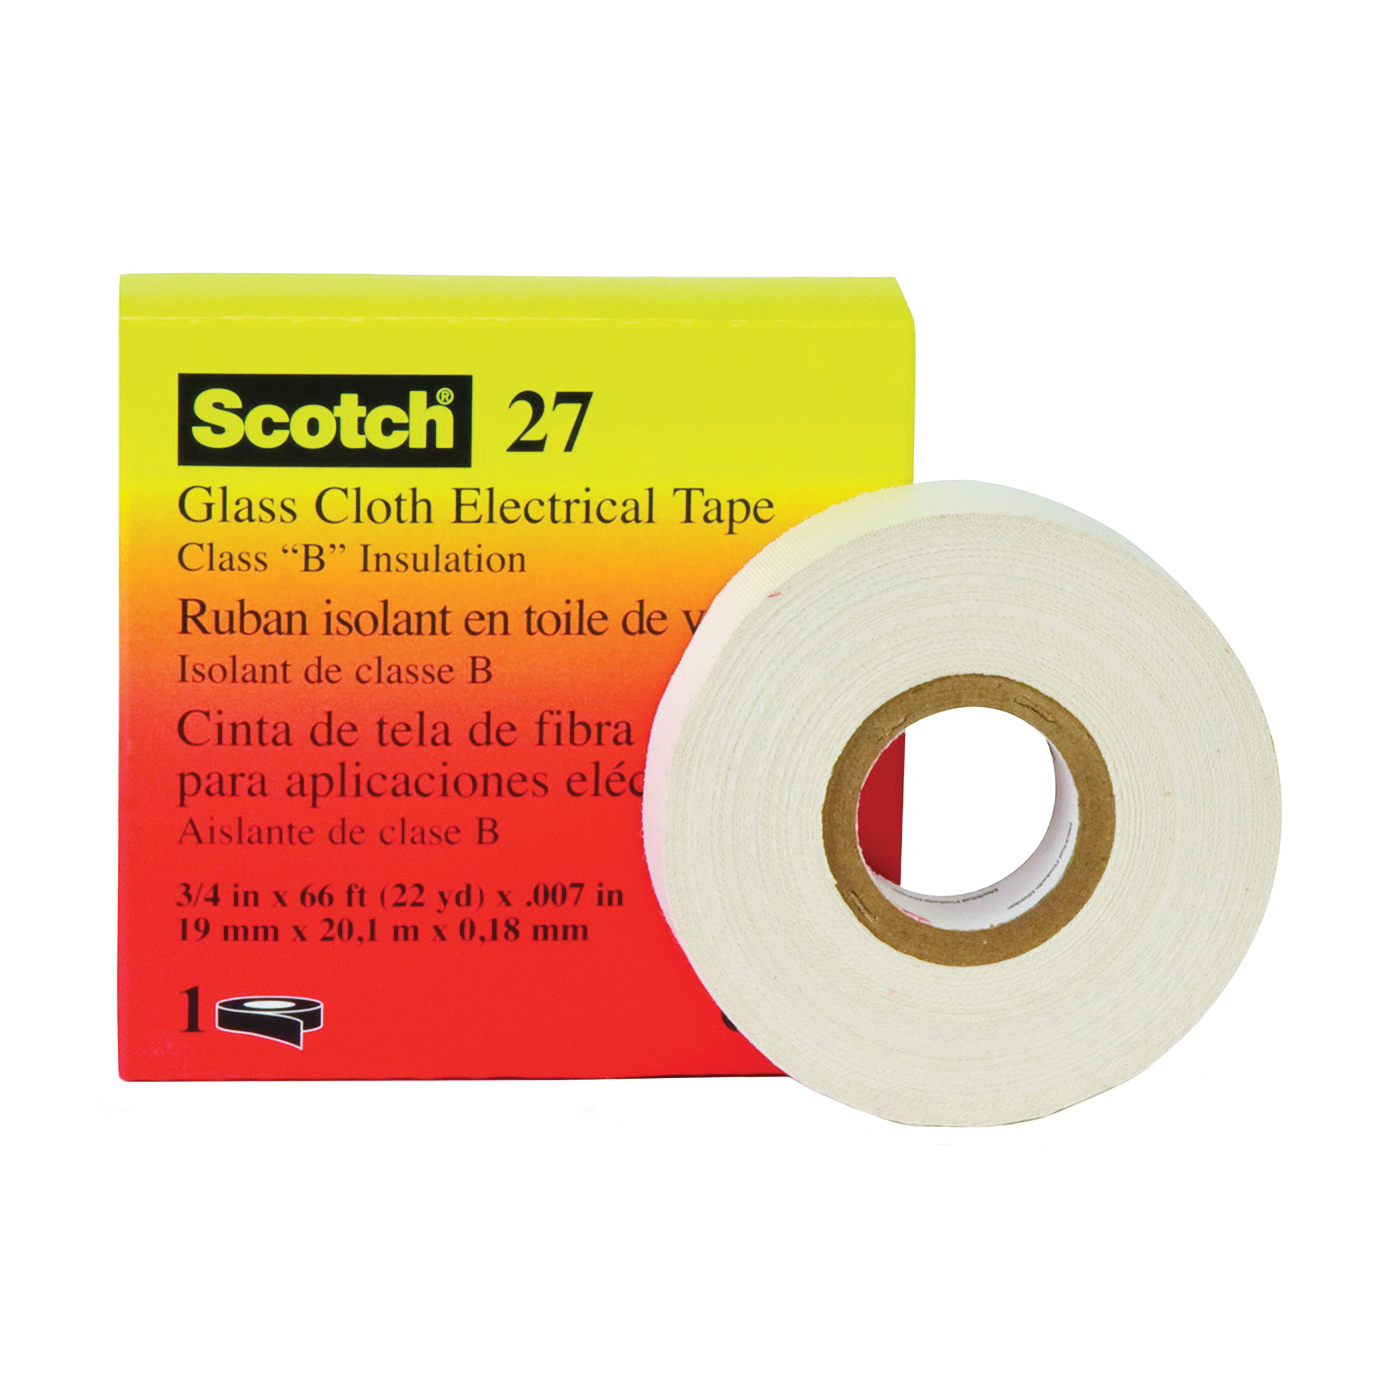 Scotch 27